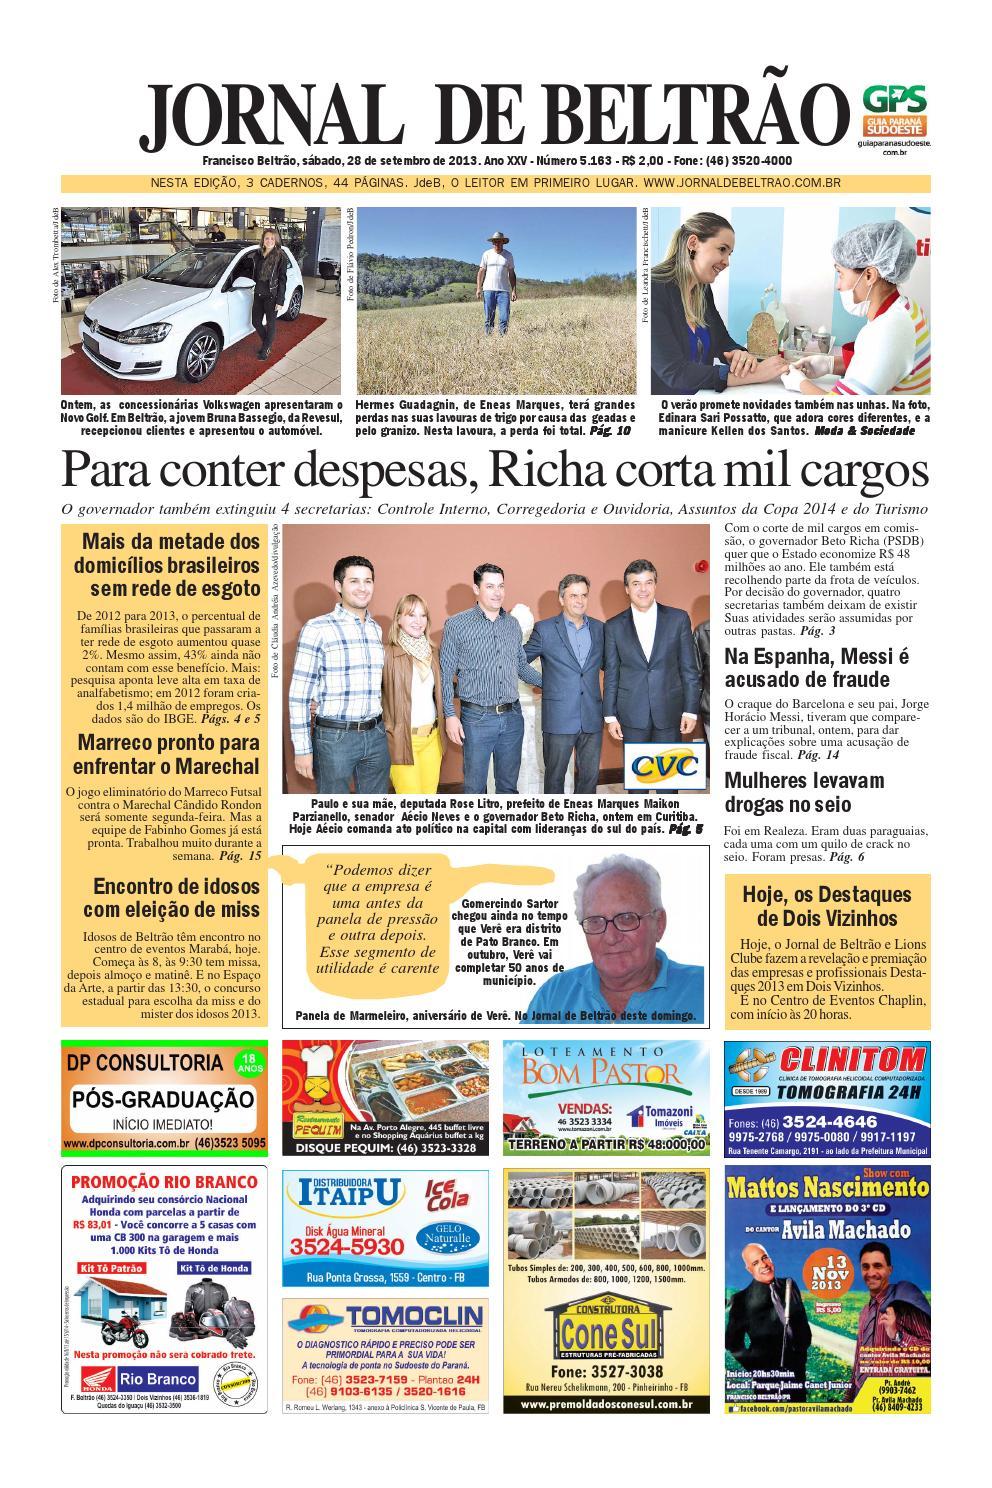 Jornaldebeltrao 5163 28 09 2013 by Orangotoe - issuu 6c2fb28347977